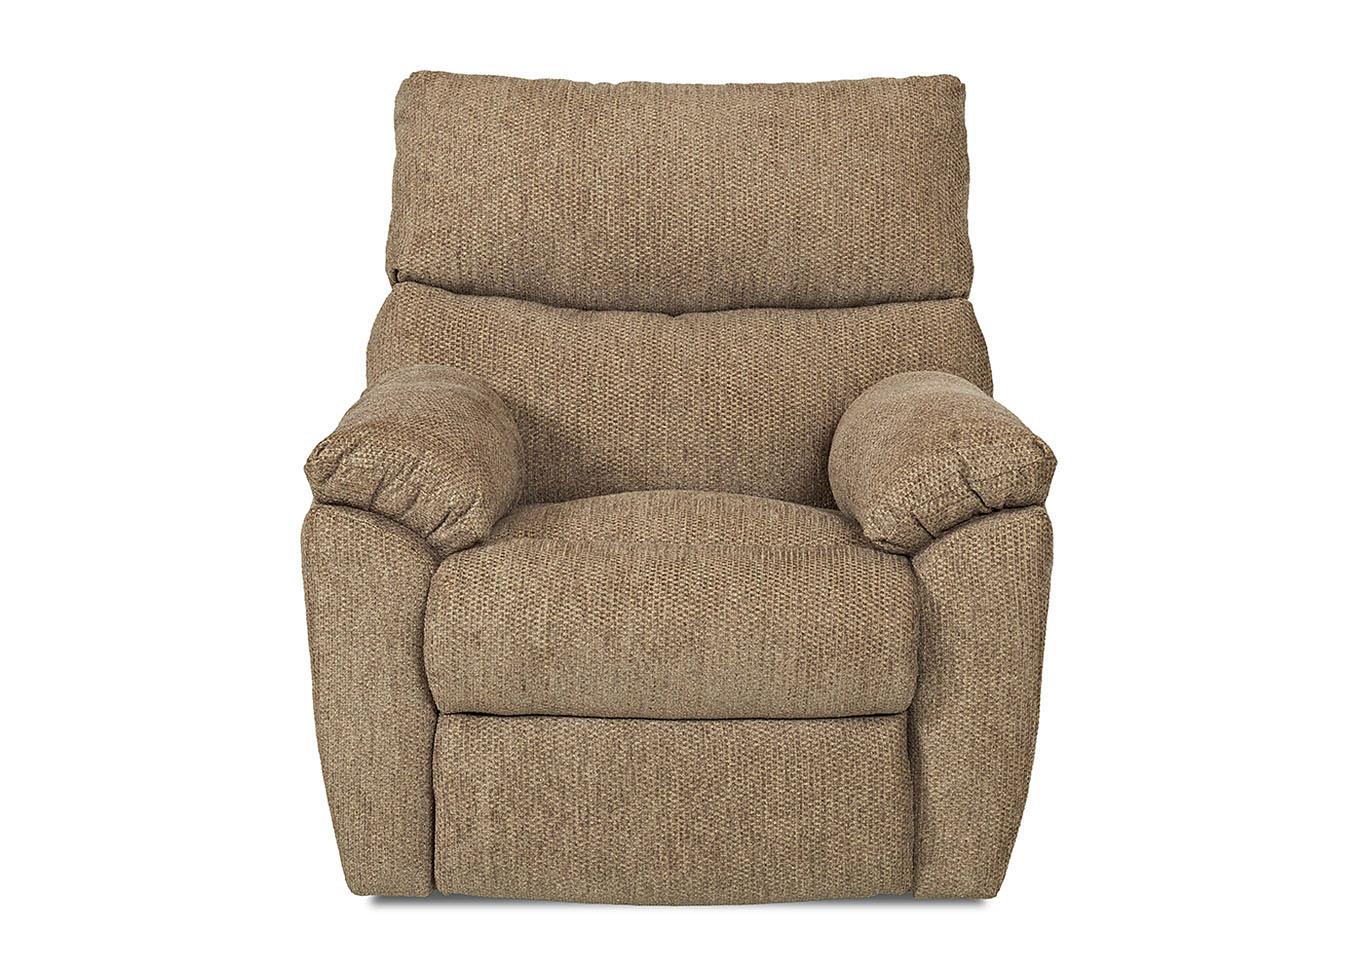 Phenomenal Harolds Furniture Lebanon Pa Odessa Reclining Swivel Spiritservingveterans Wood Chair Design Ideas Spiritservingveteransorg